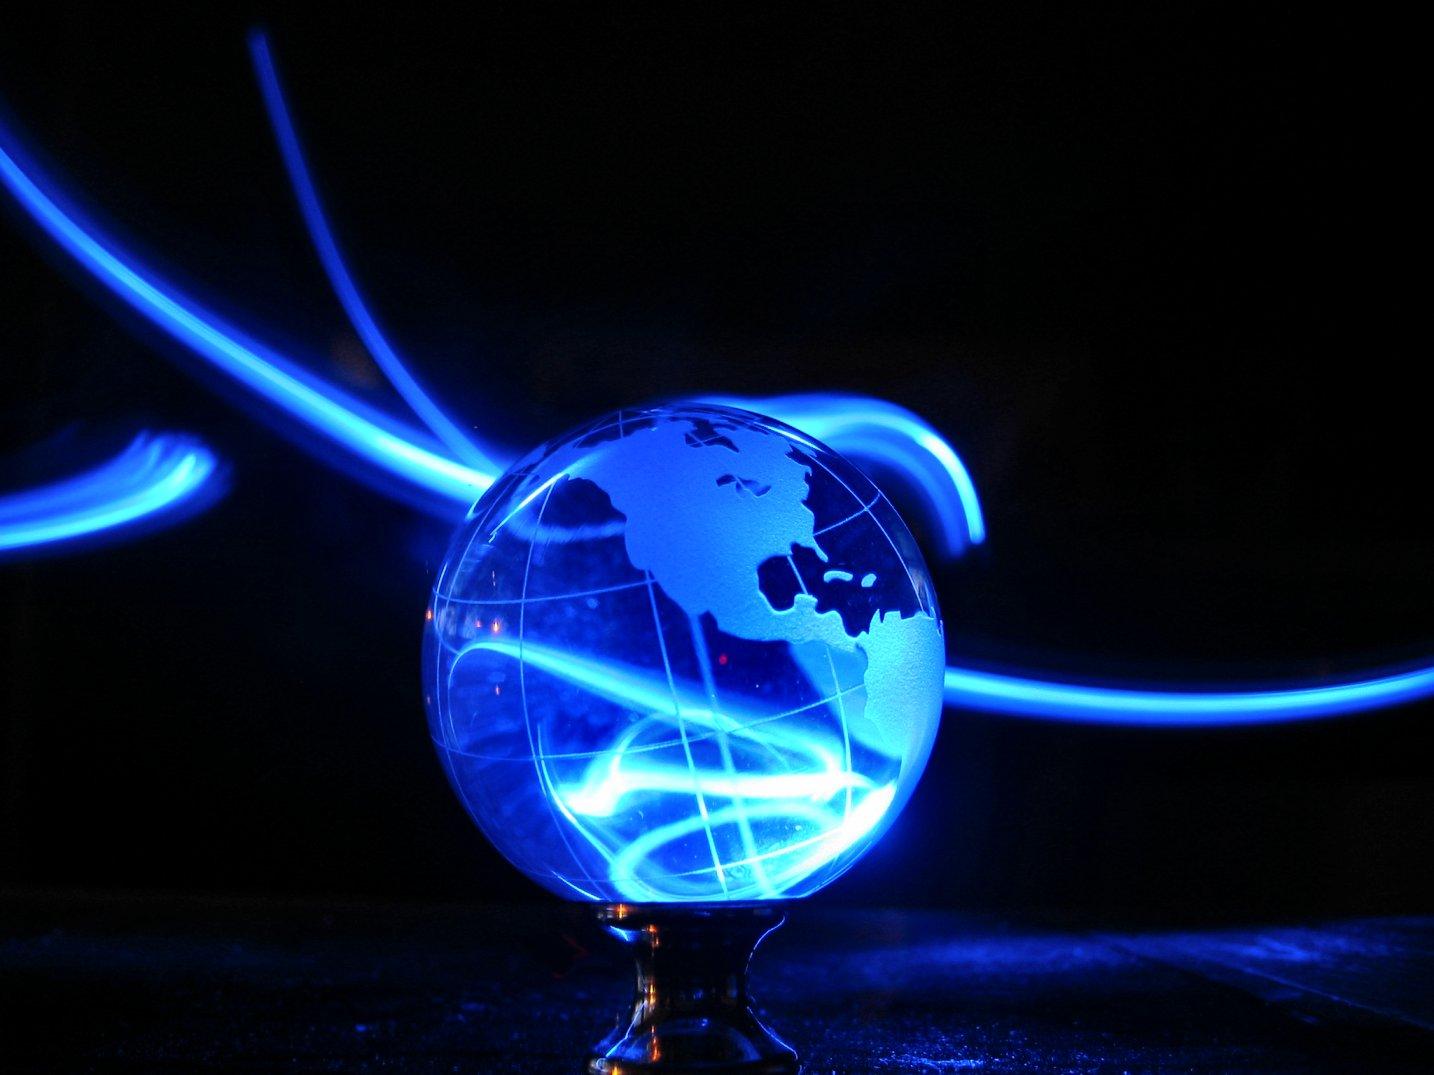 http://soul-amp.com/pics/pics_to_post_electric_globe/Electric_Earth_Globe__soul-amp_1